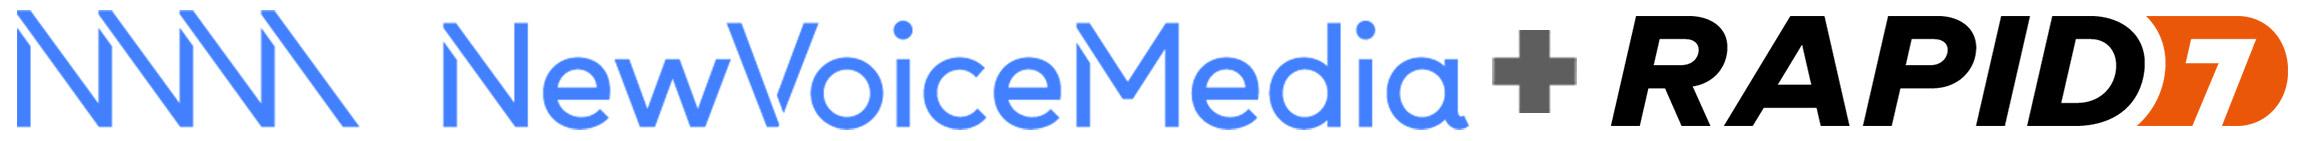 NewVoiceMedia + Rapid7